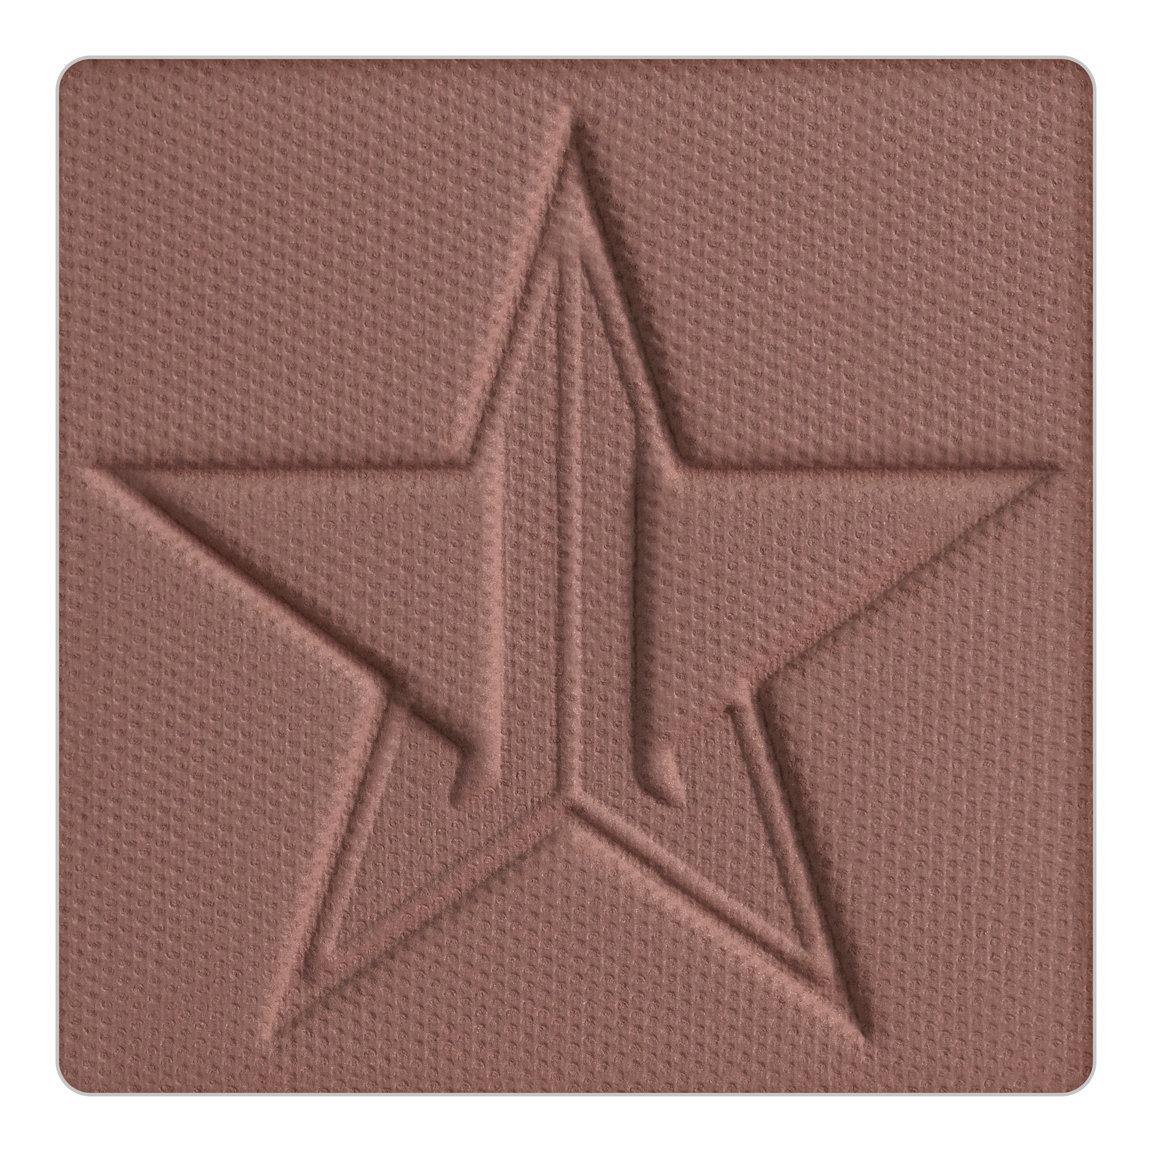 Jeffree Star Cosmetics Artistry Singles Tasty alternative view 1.